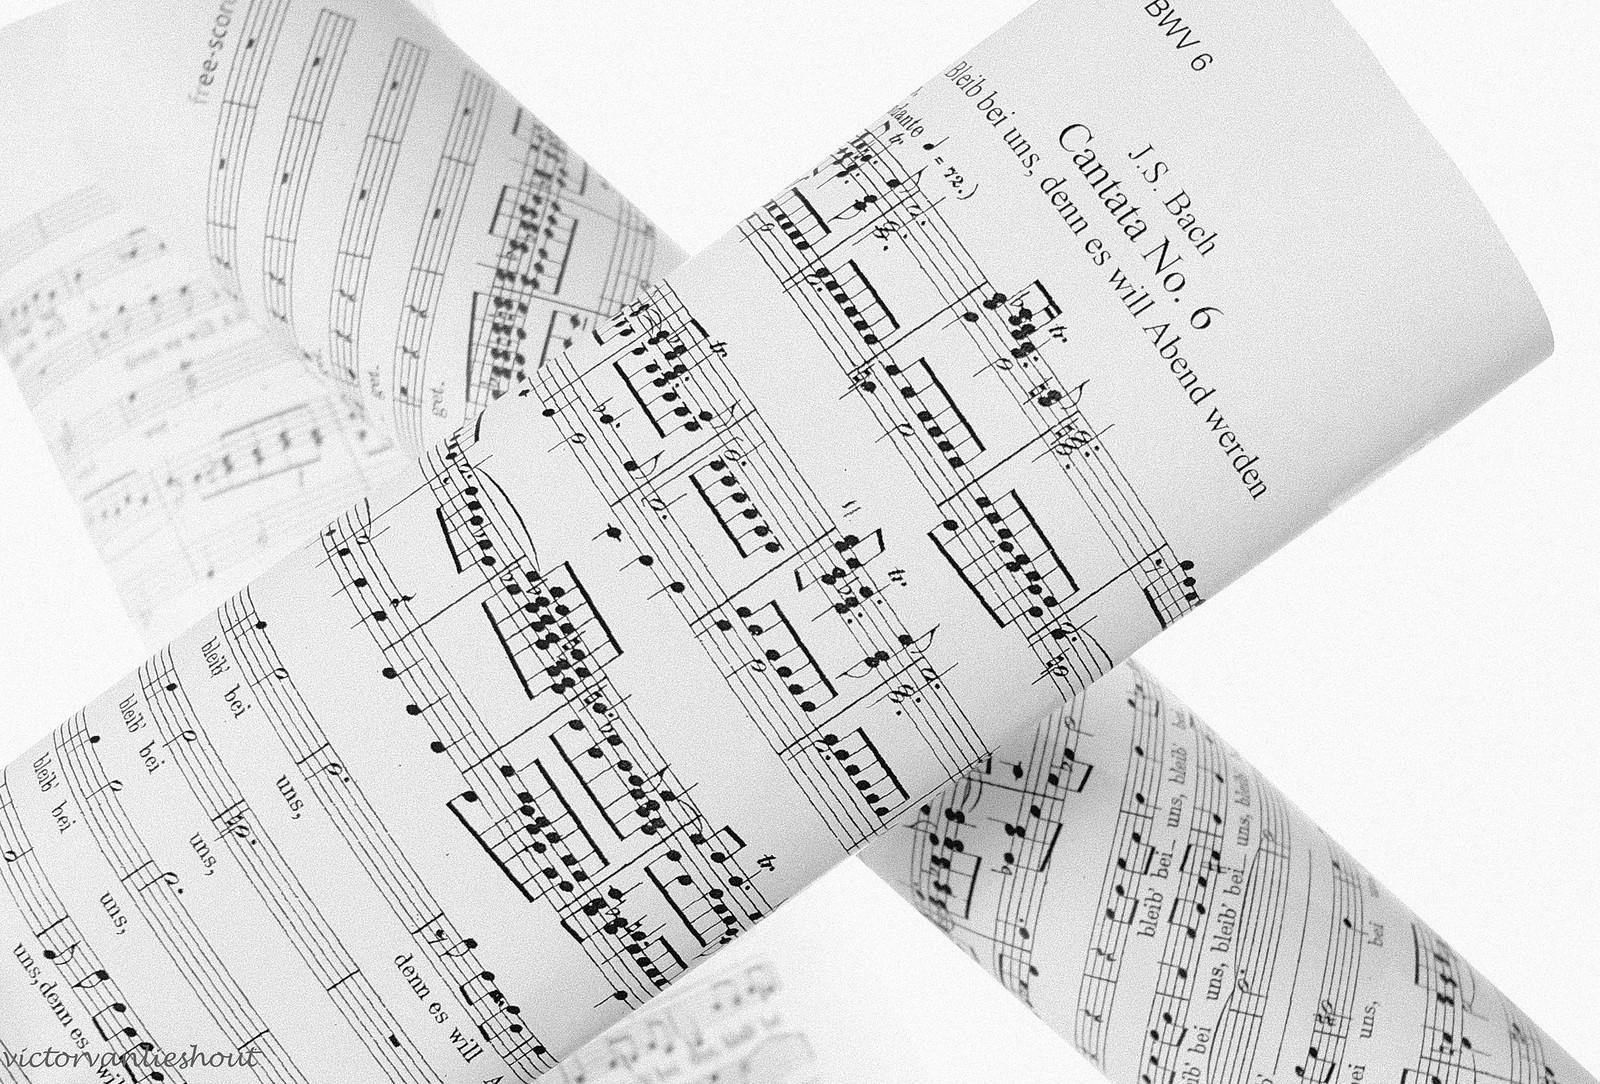 20200520_BWV 6 -1-3_7595-2